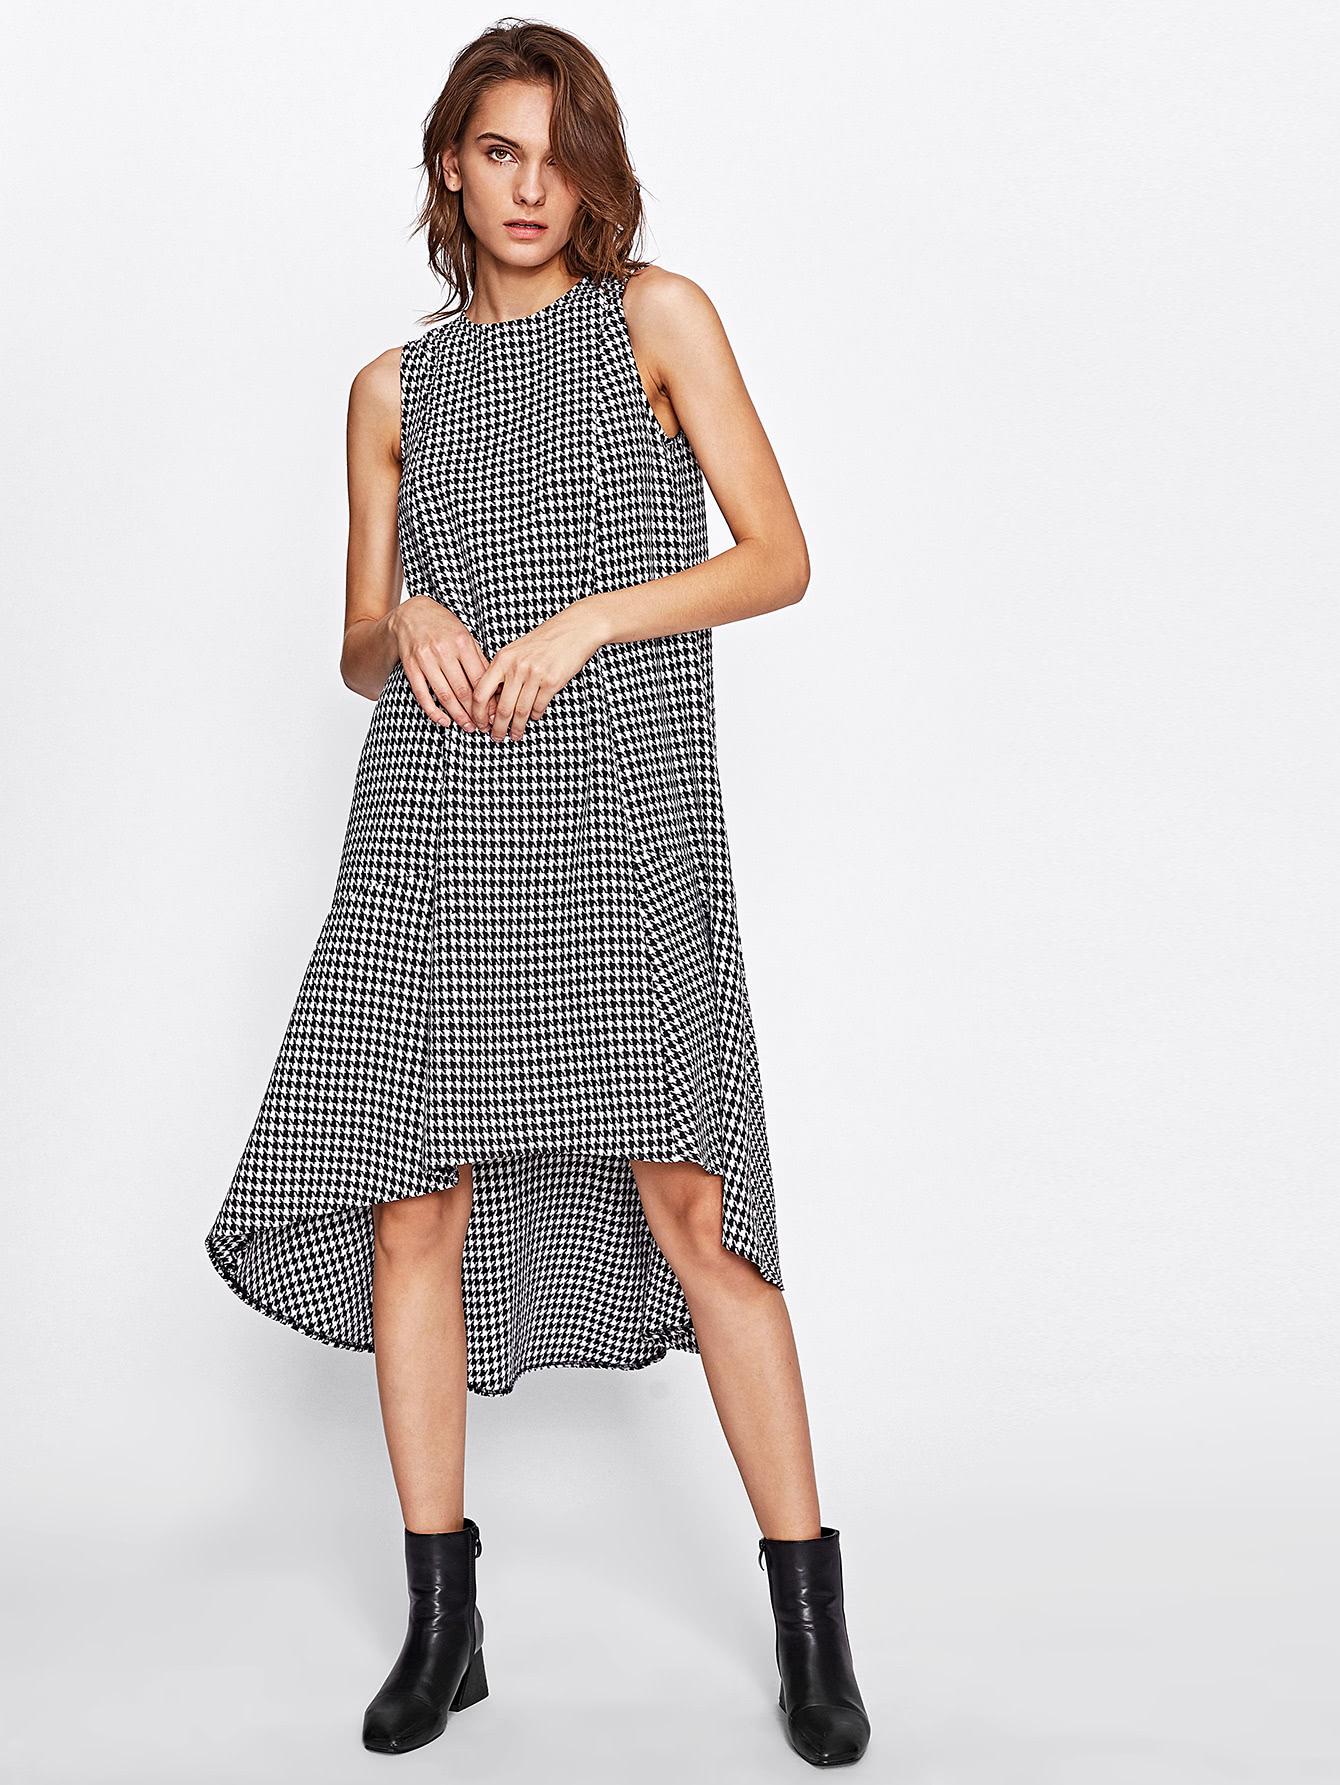 Dip Hem Swing Houndstooth Dress